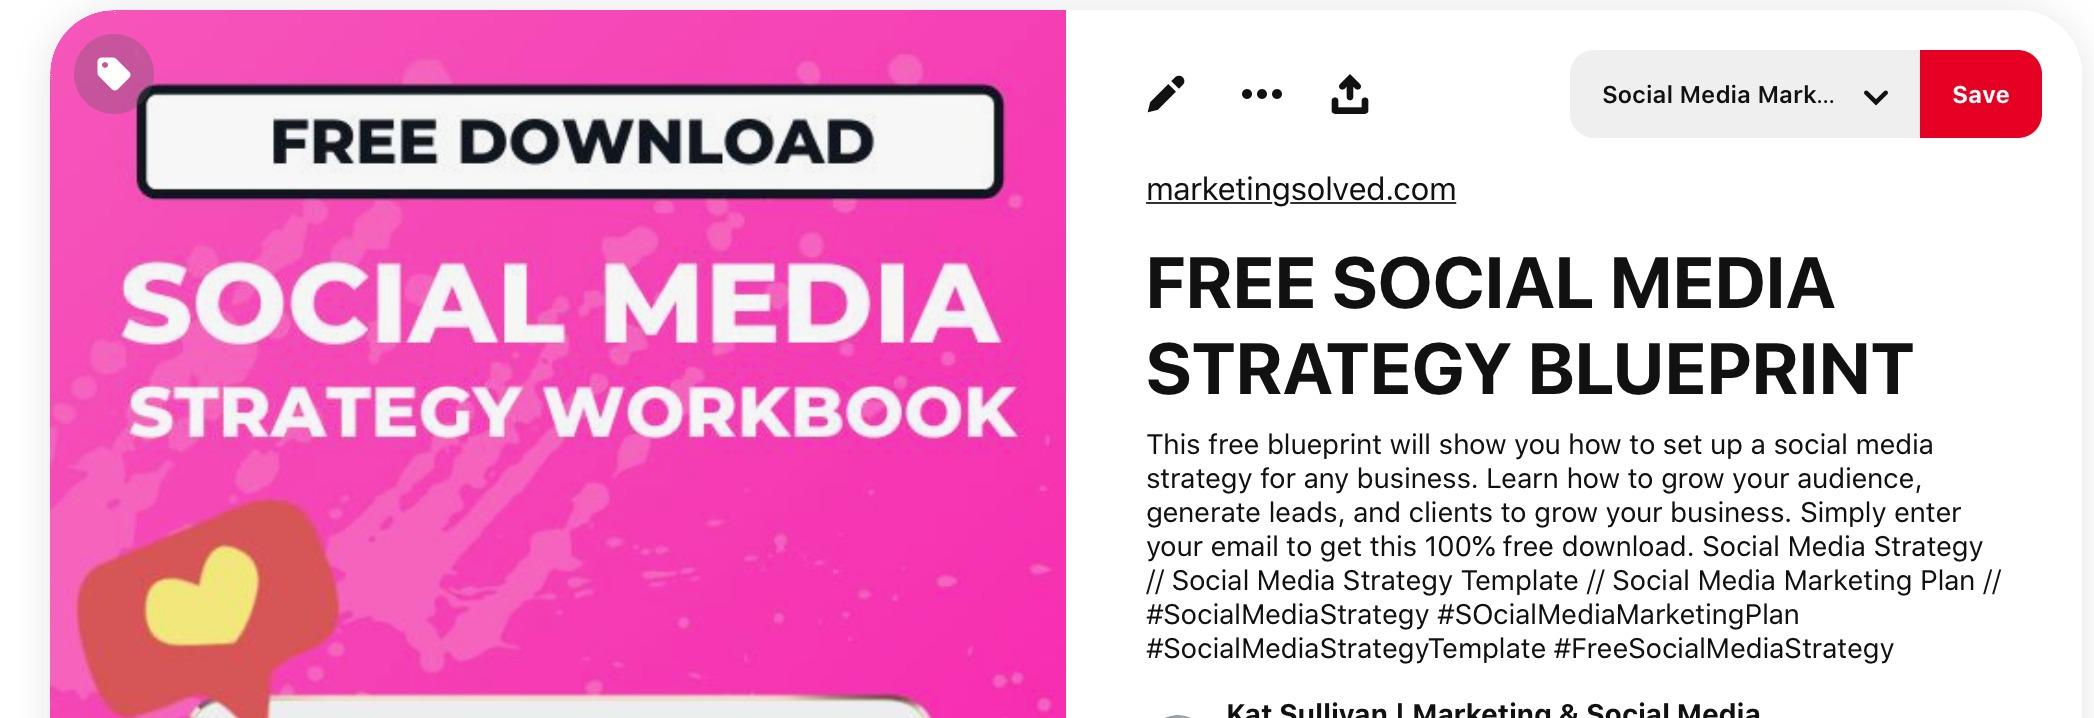 8 Pinterest SEO Hacks That Get More Followers, Repins, & Clicks